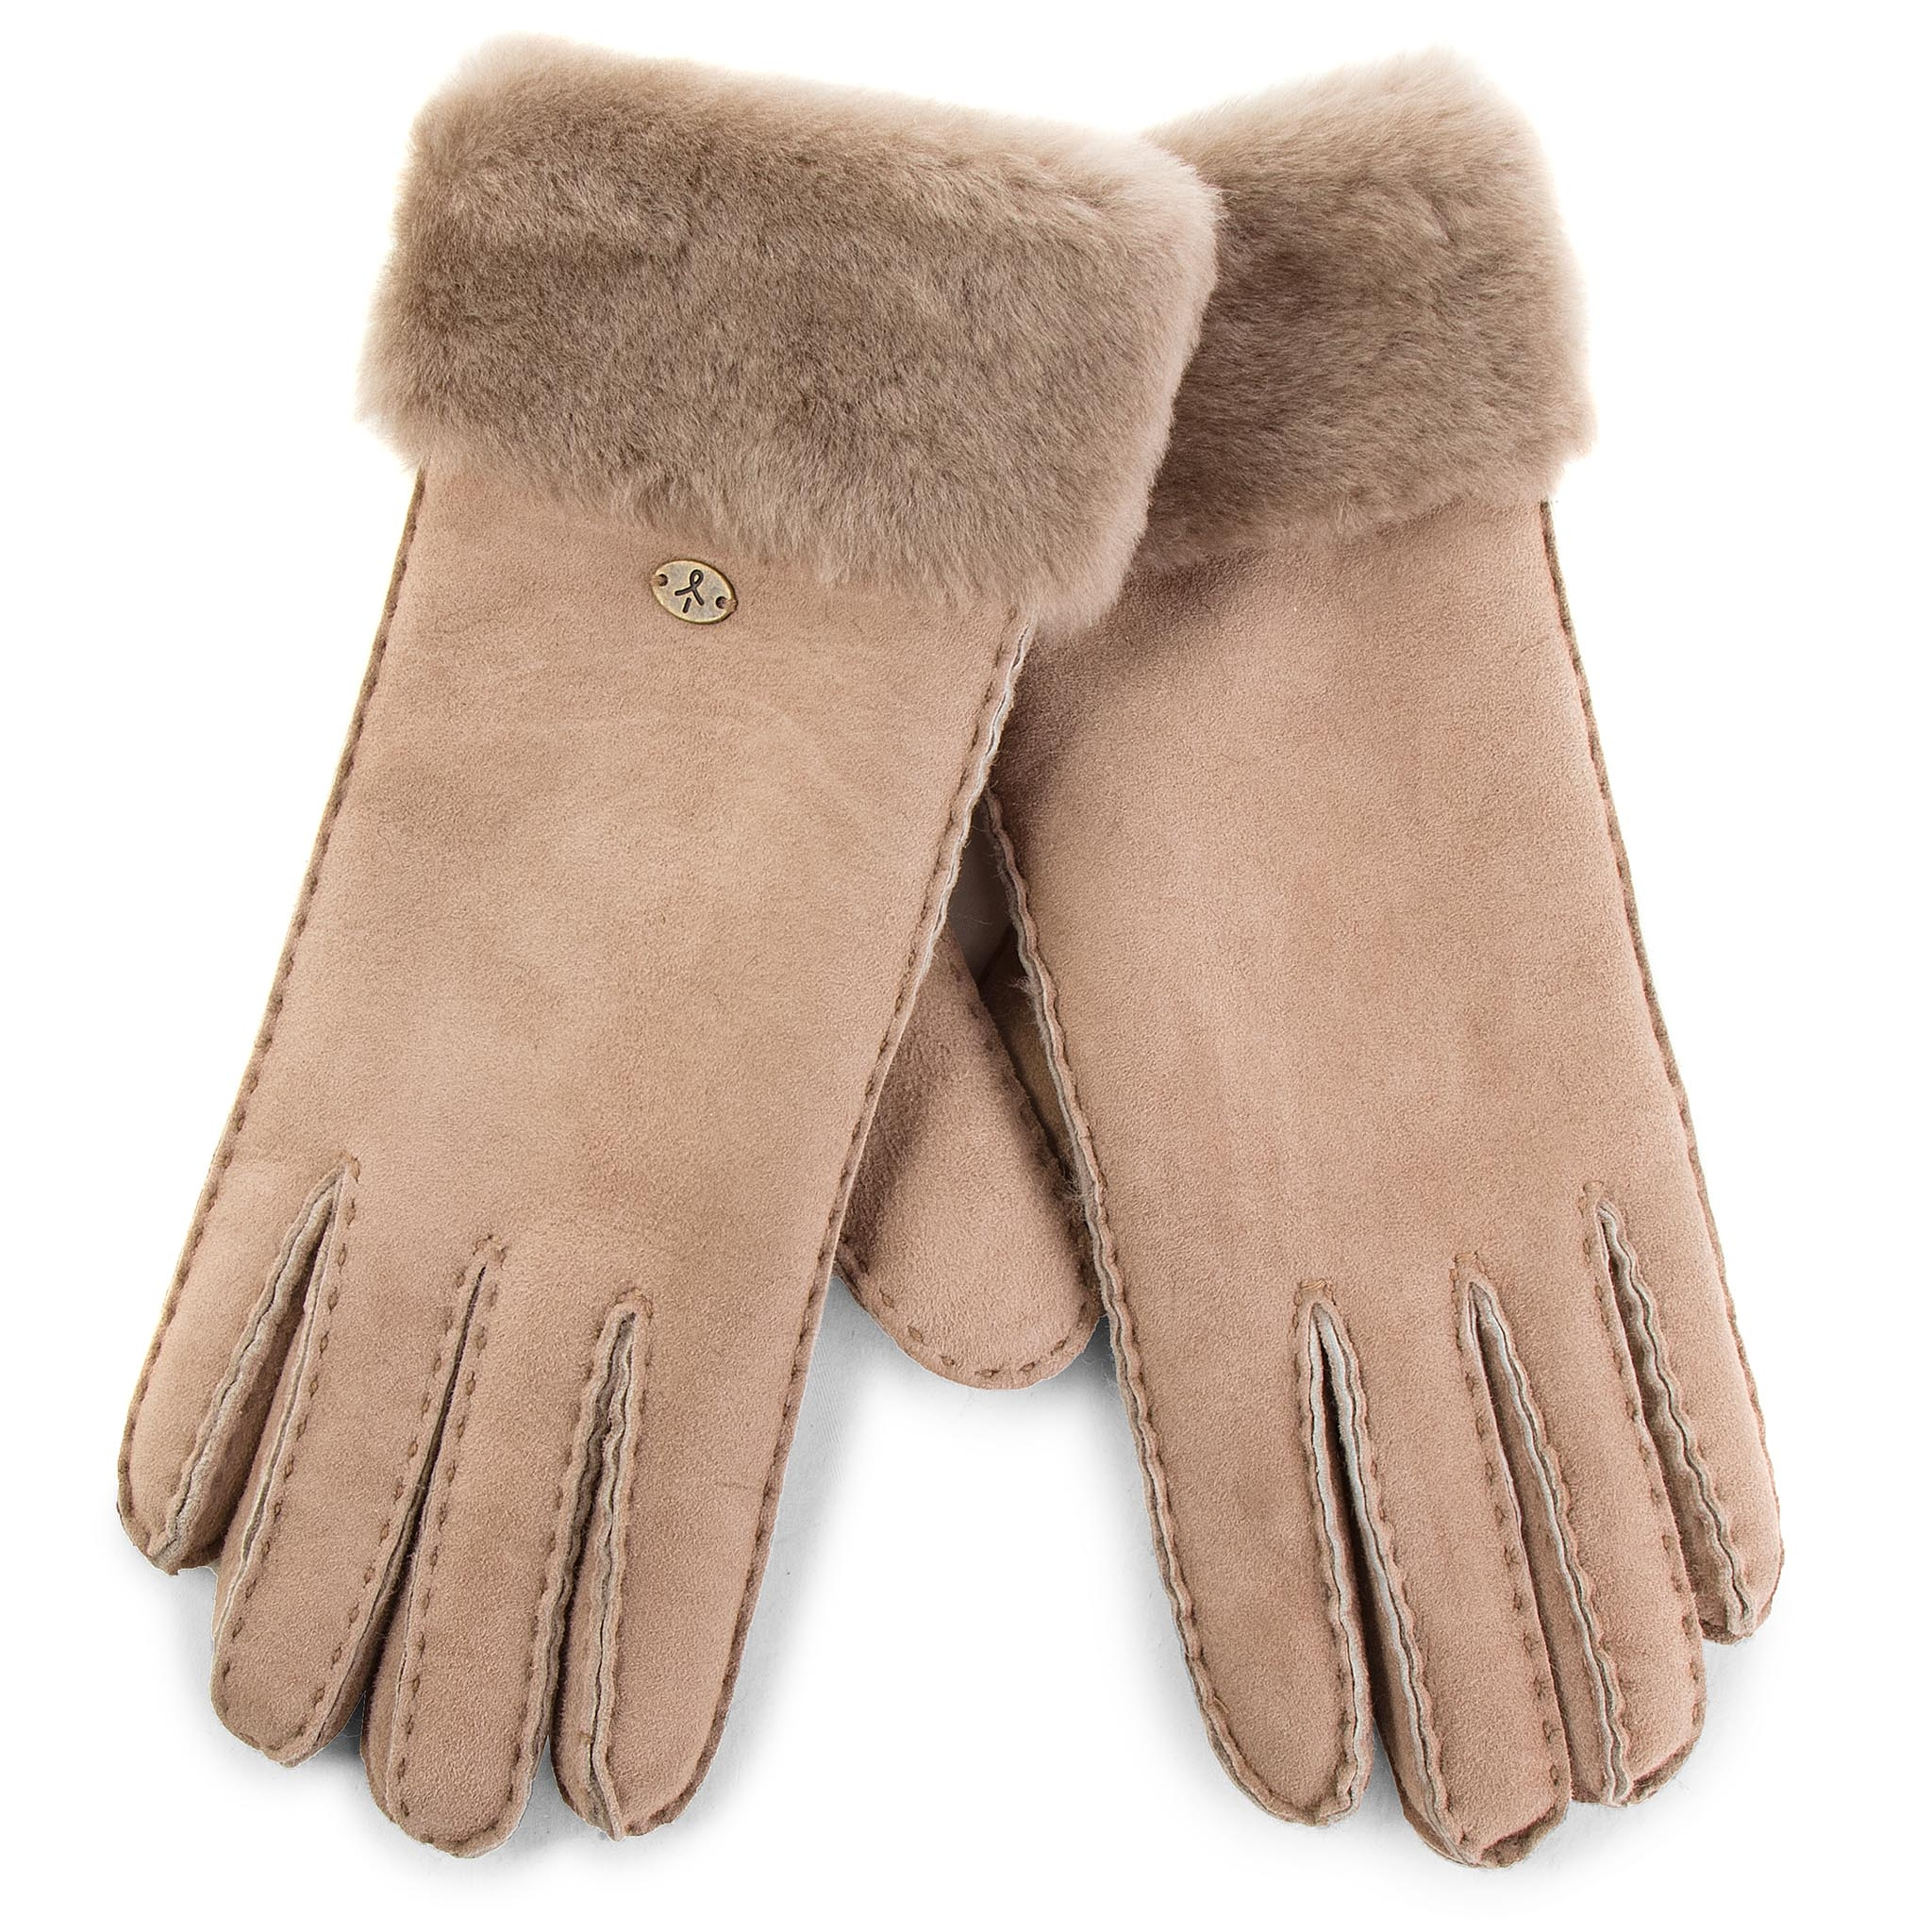 Image of Damenhandschuhe EMU AUSTRALIA - Apollo Bay Gloves Mushroom